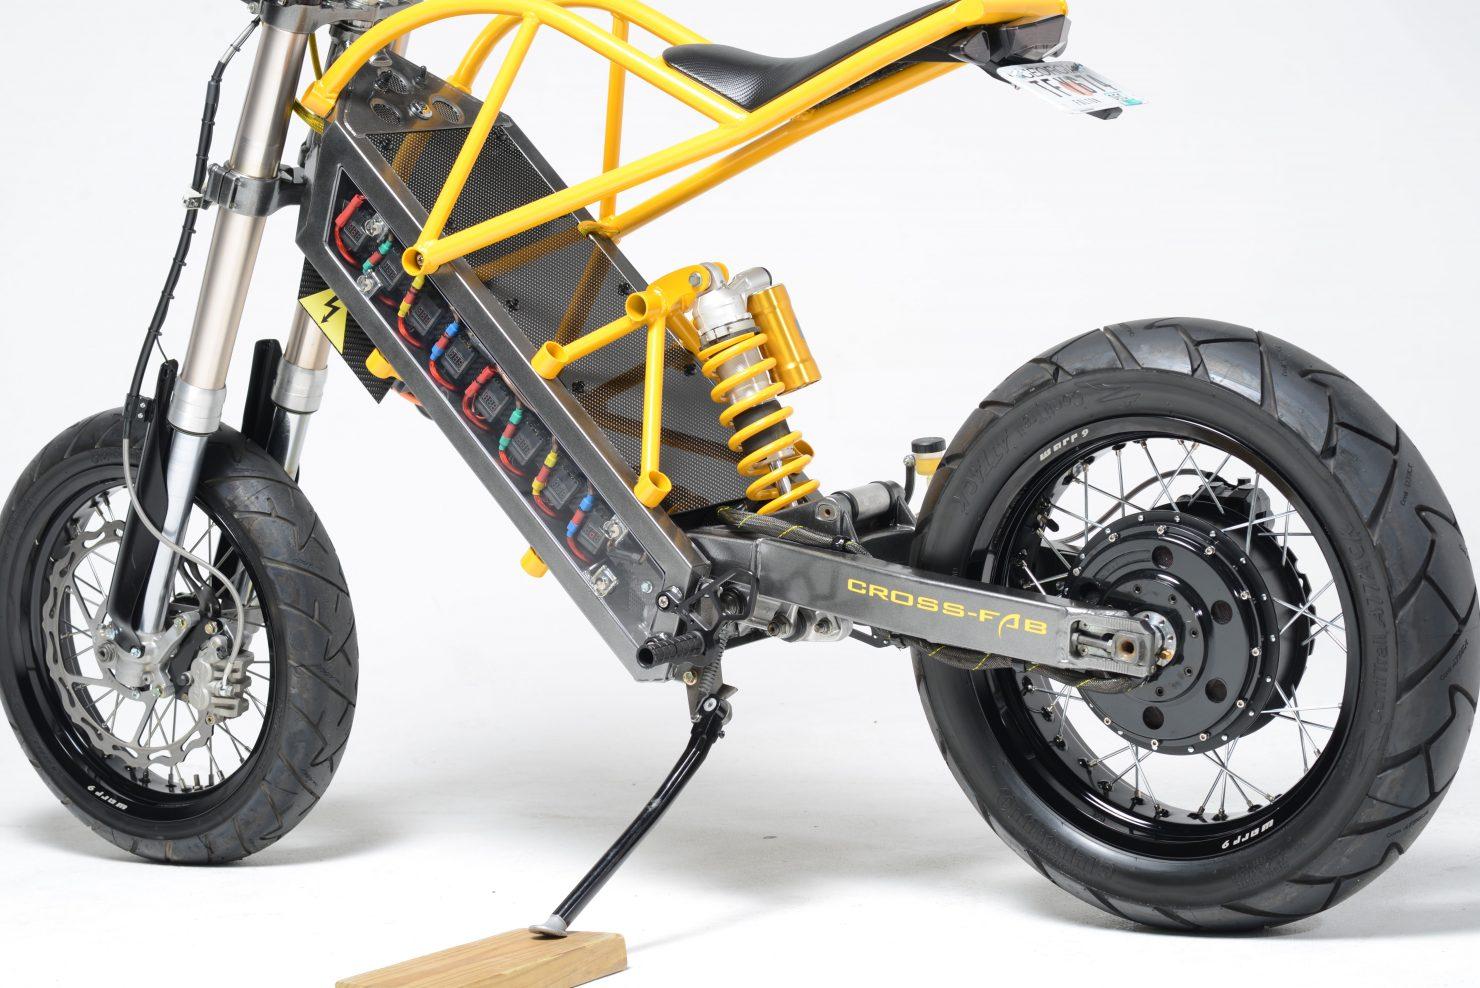 ExoDyne Electric Motorcycle 9 1480x988 - ExoDyne Electric Motorcycle